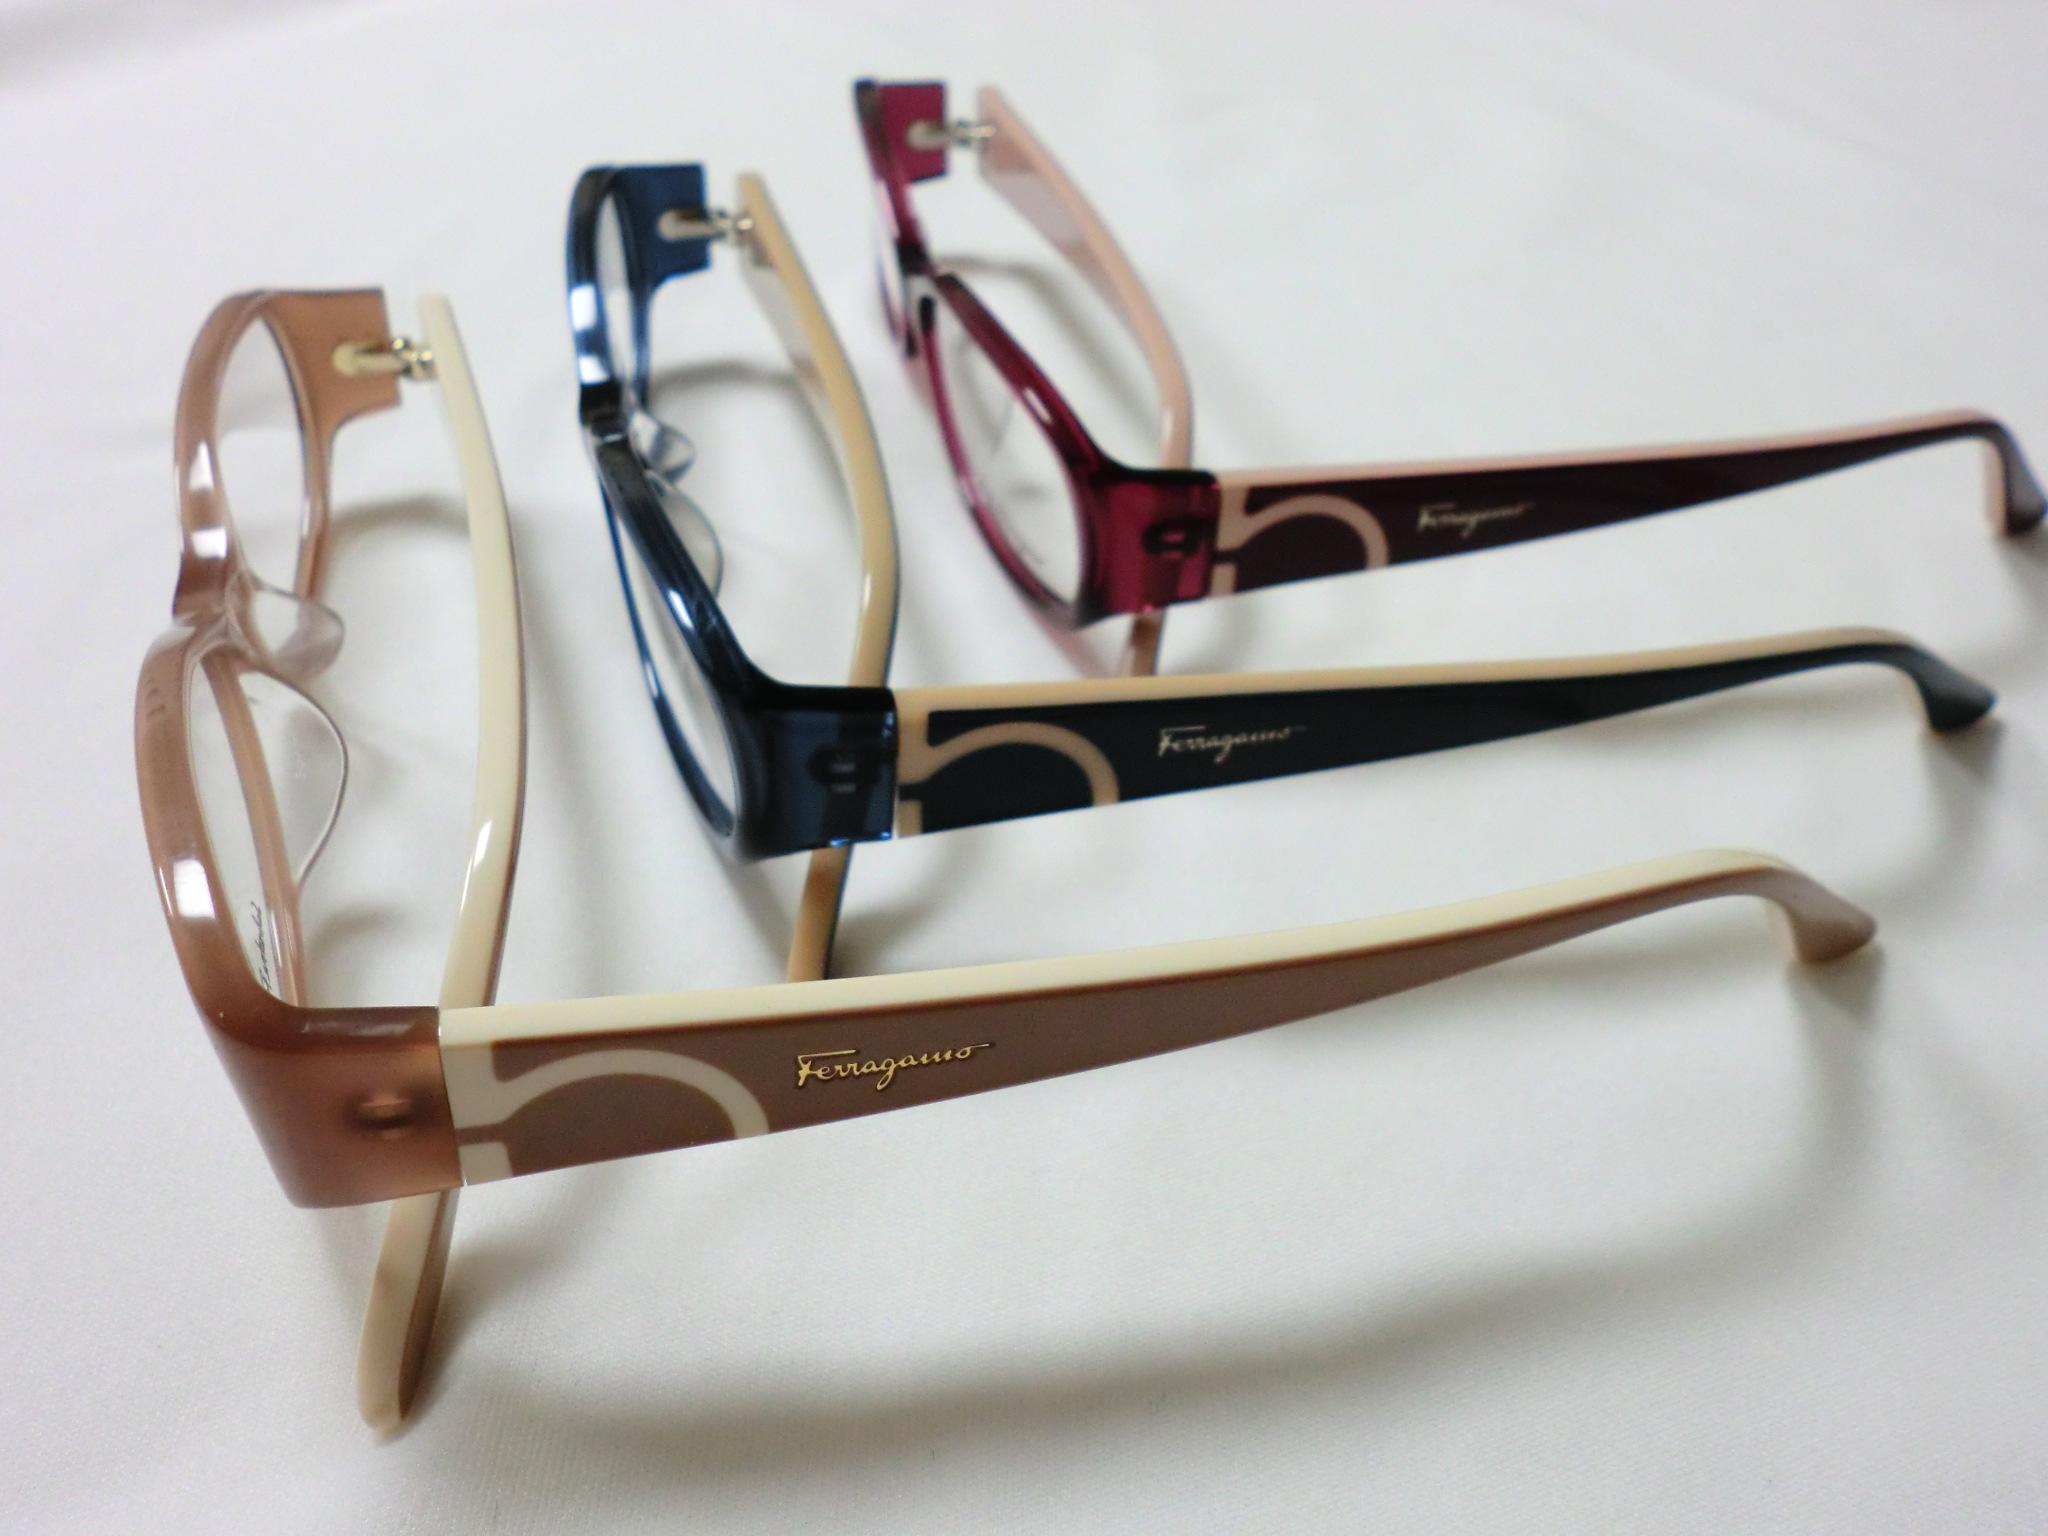 http://www.washin-optical.co.jp/blog/ladies/%E3%83%95%E3%82%A7%E3%83%A9%E3%82%AC%E3%83%A2%EF%BC%91.JPG